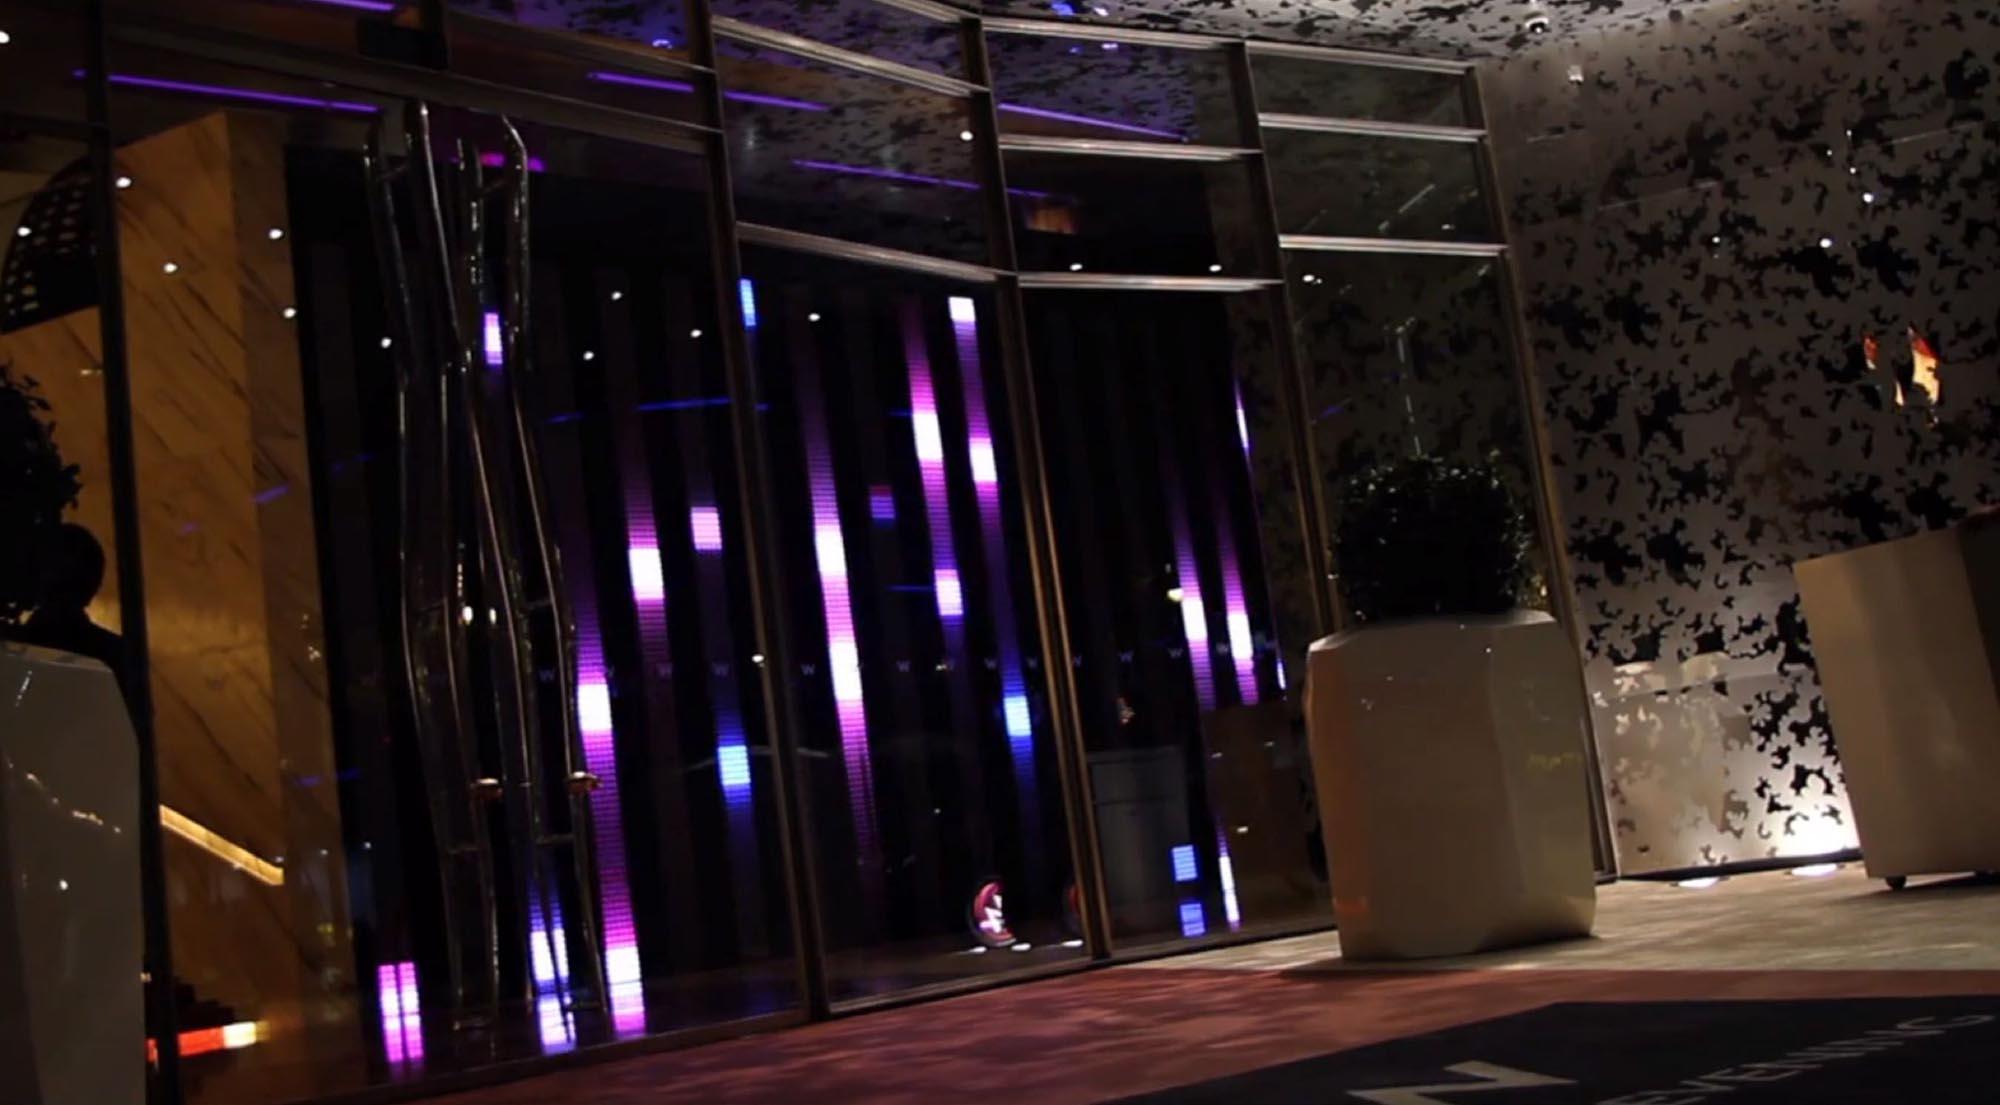 W Hotel Lobby with Spectrum Installation